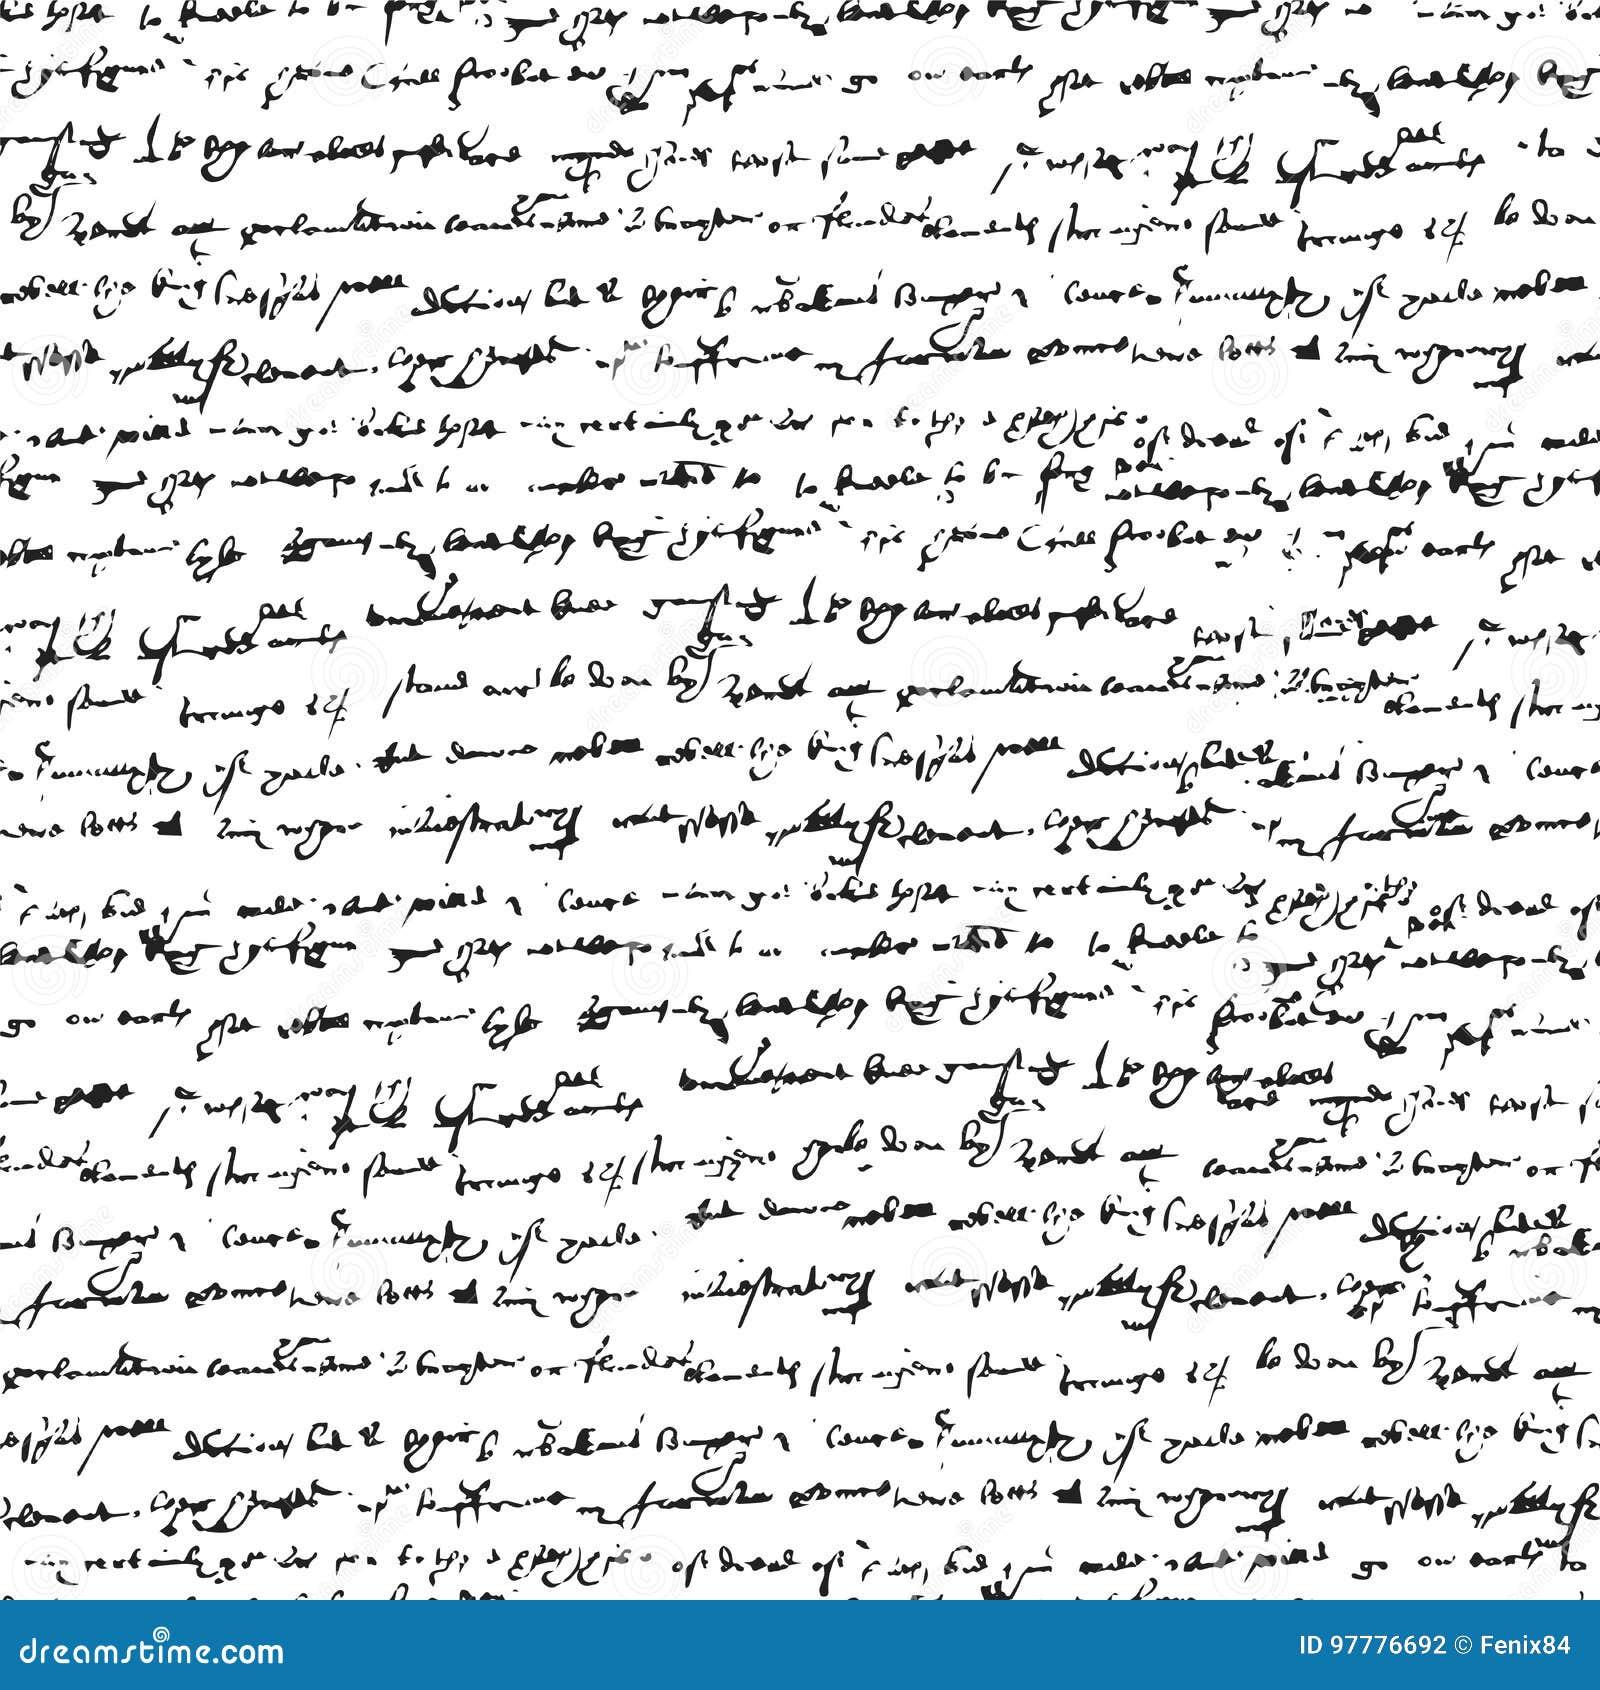 Texto manuscrito inclinado ilegible